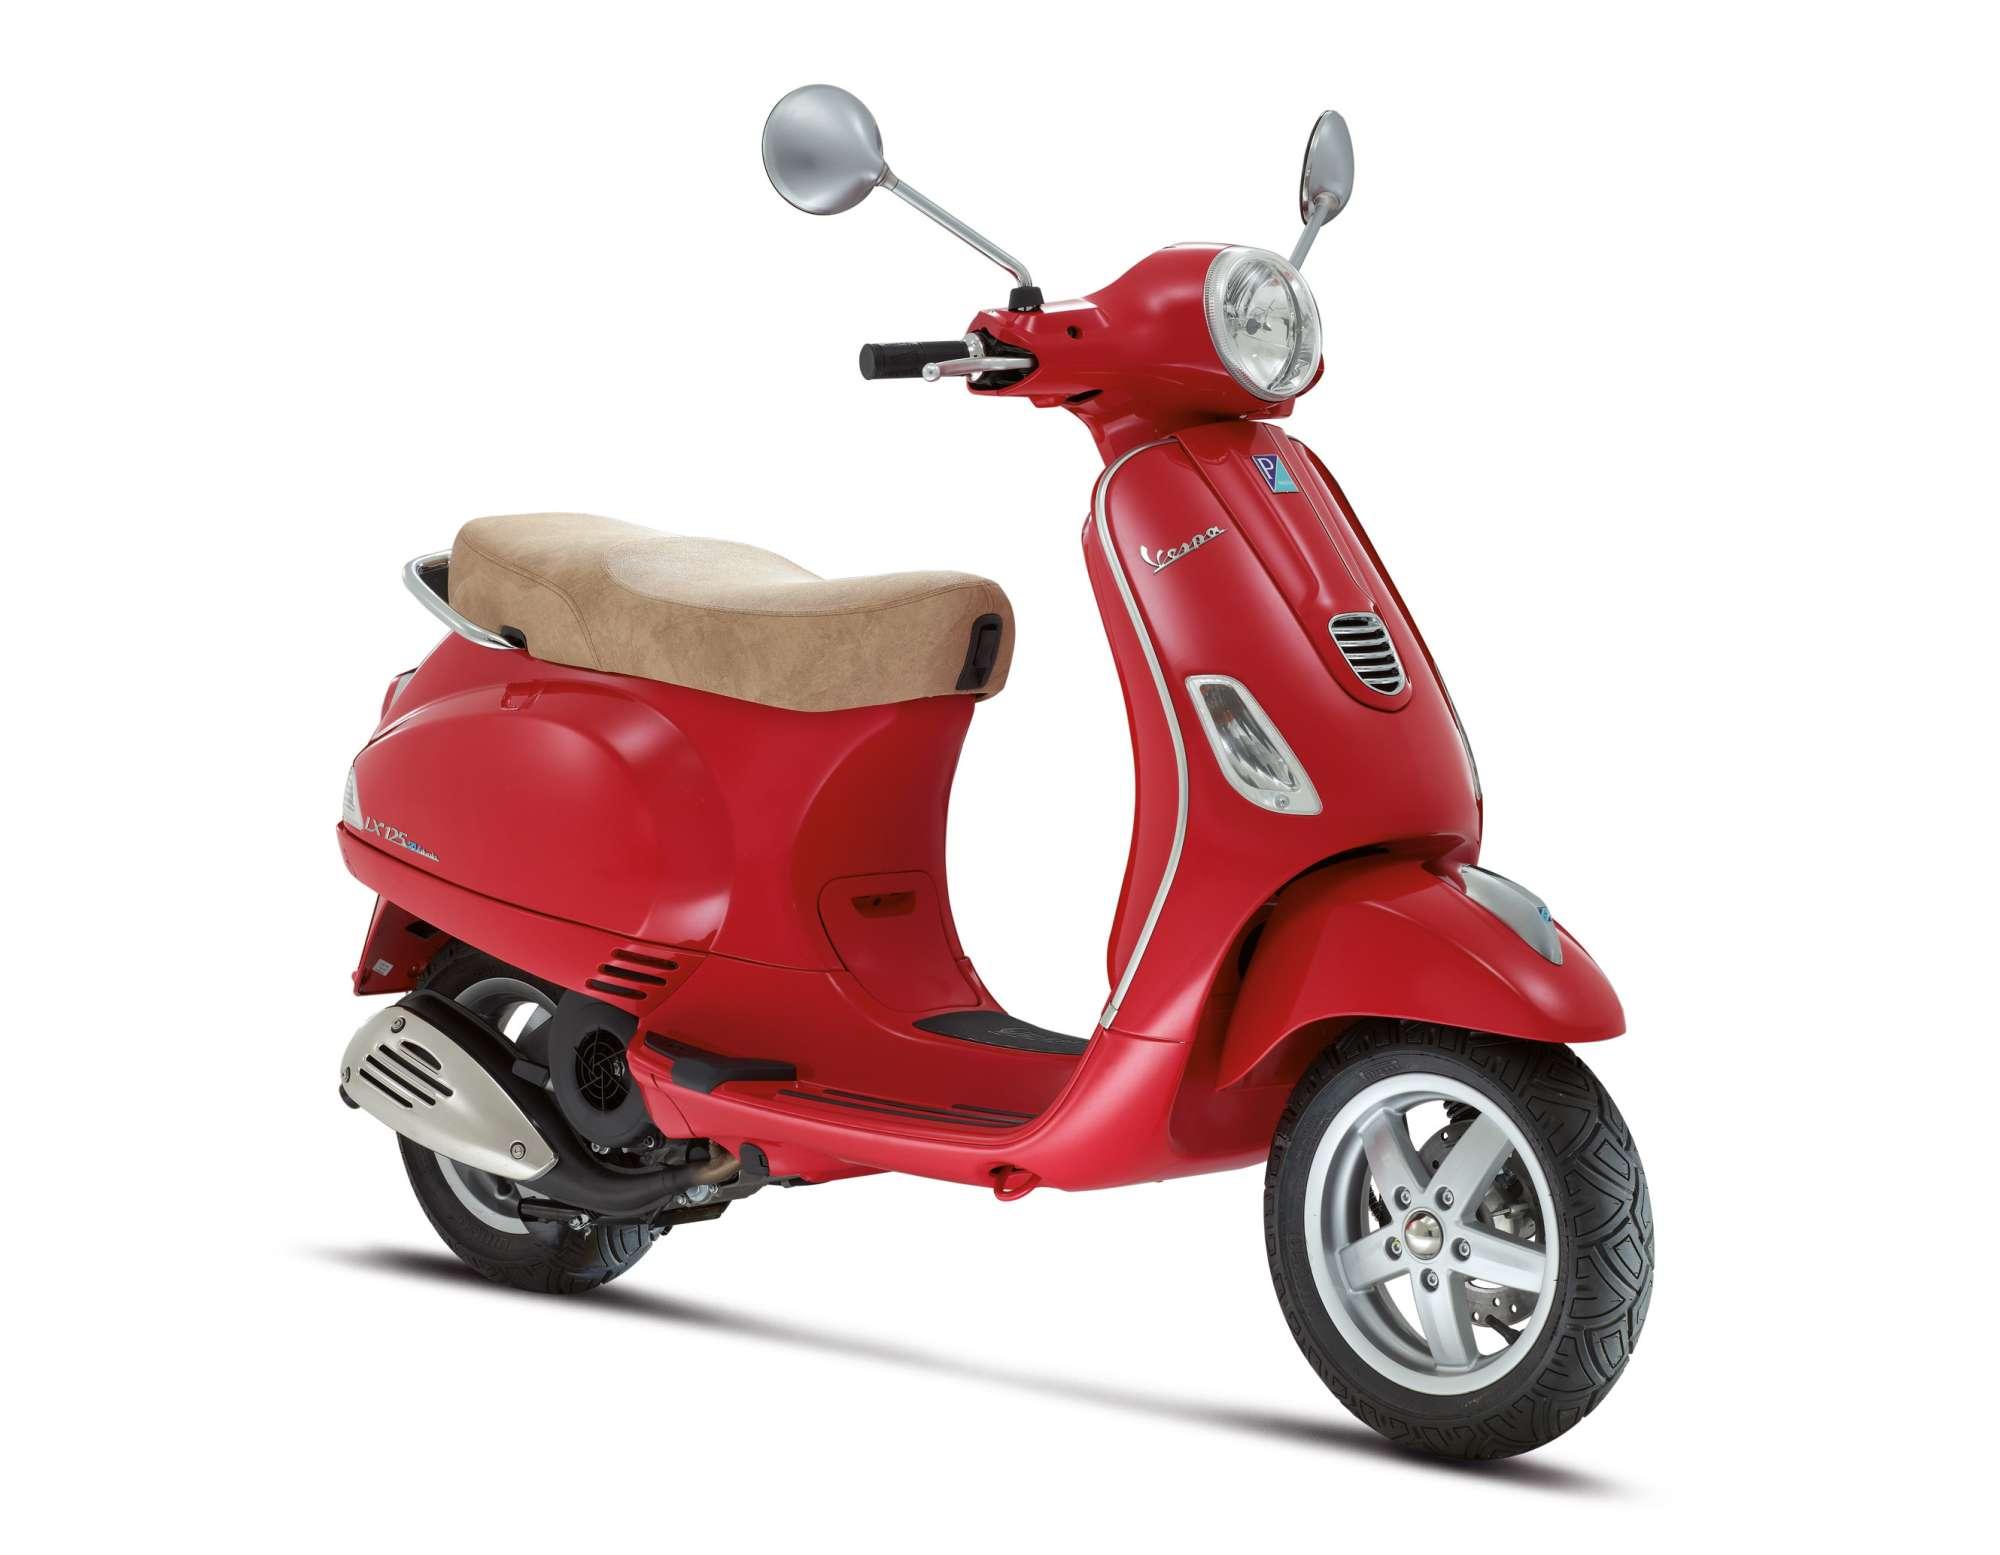 Motorrad Occasion Vespa LX 125 i.e. 3V kaufen